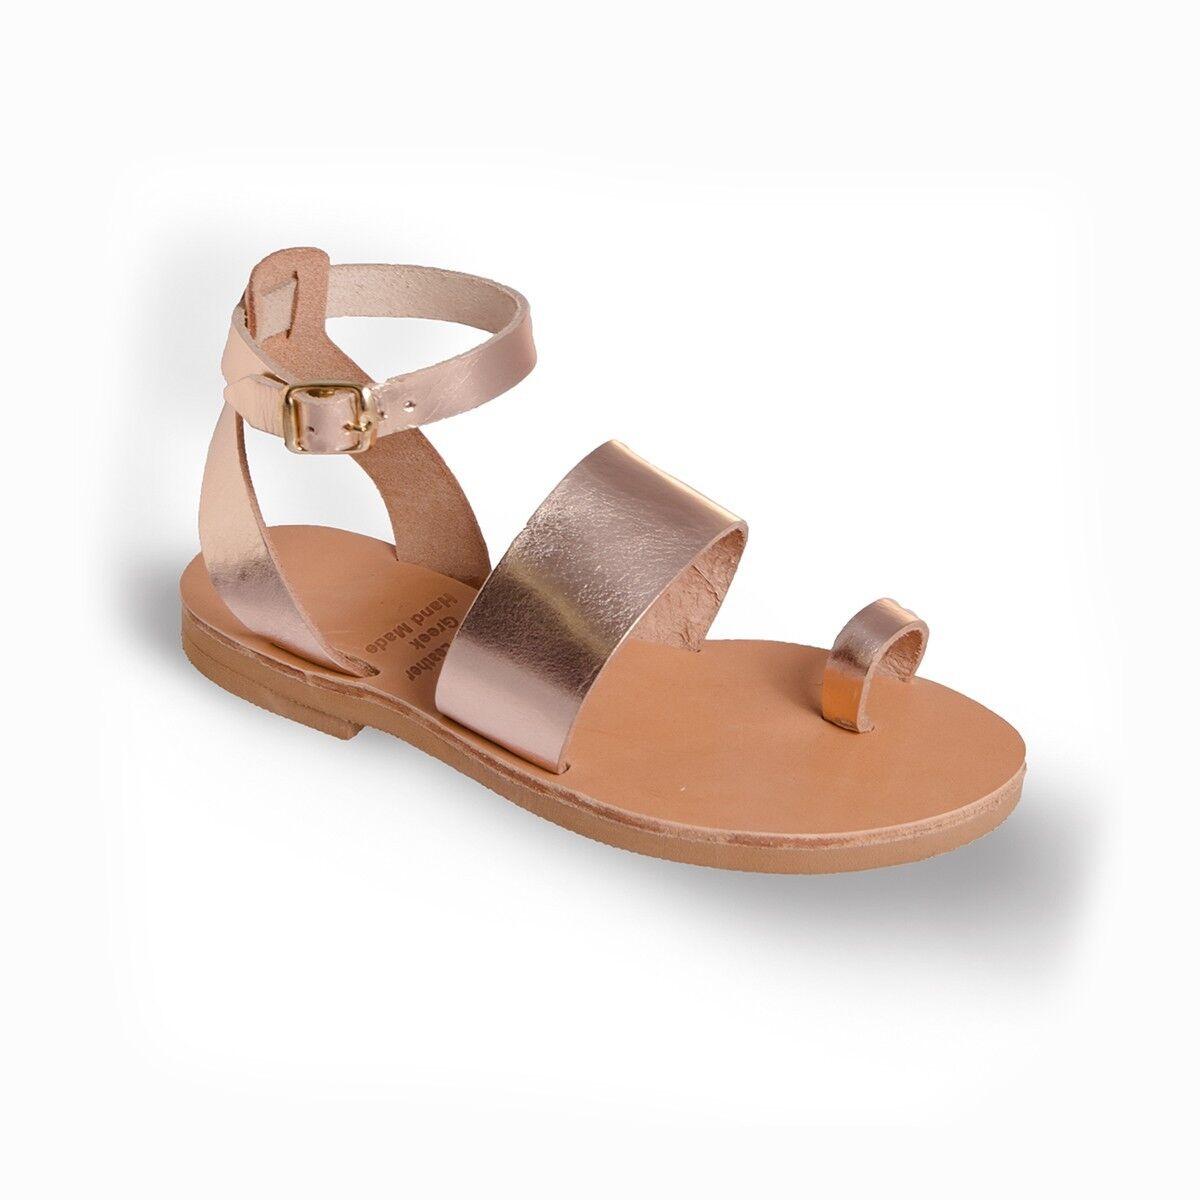 Ancient Greek Damenschuhe Damenschuhe Damenschuhe Sandales Gladiator Roman Handmade Genuine Leder Schuhes Flat 30fbfa